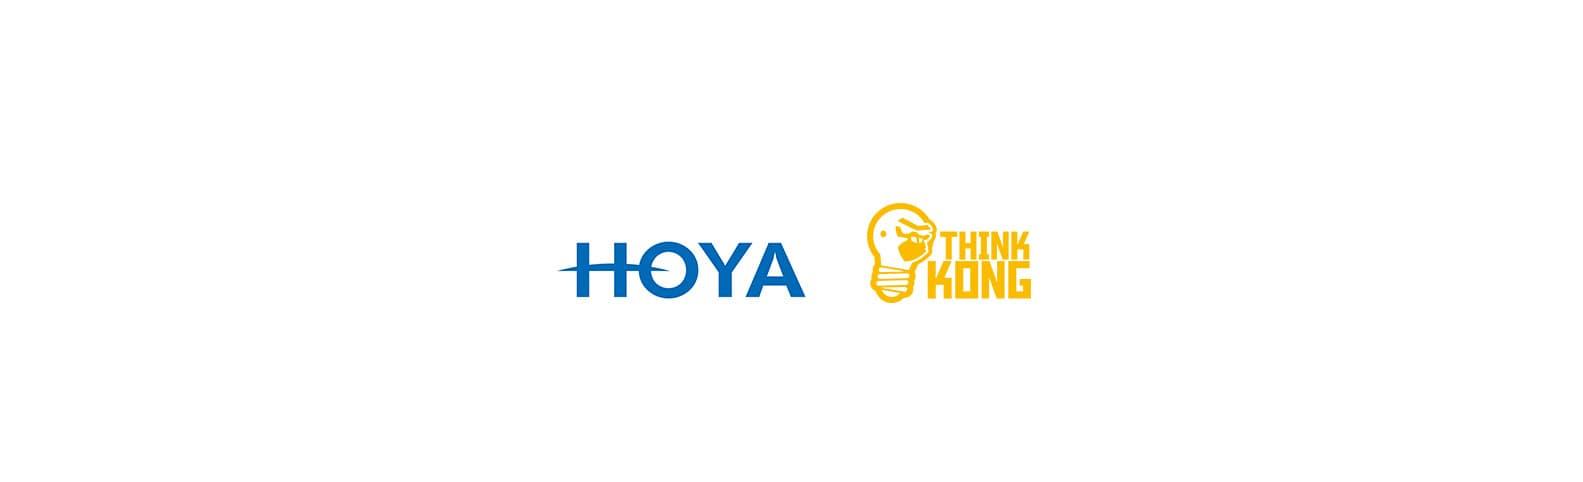 Hoya Lens Poland Think Kong